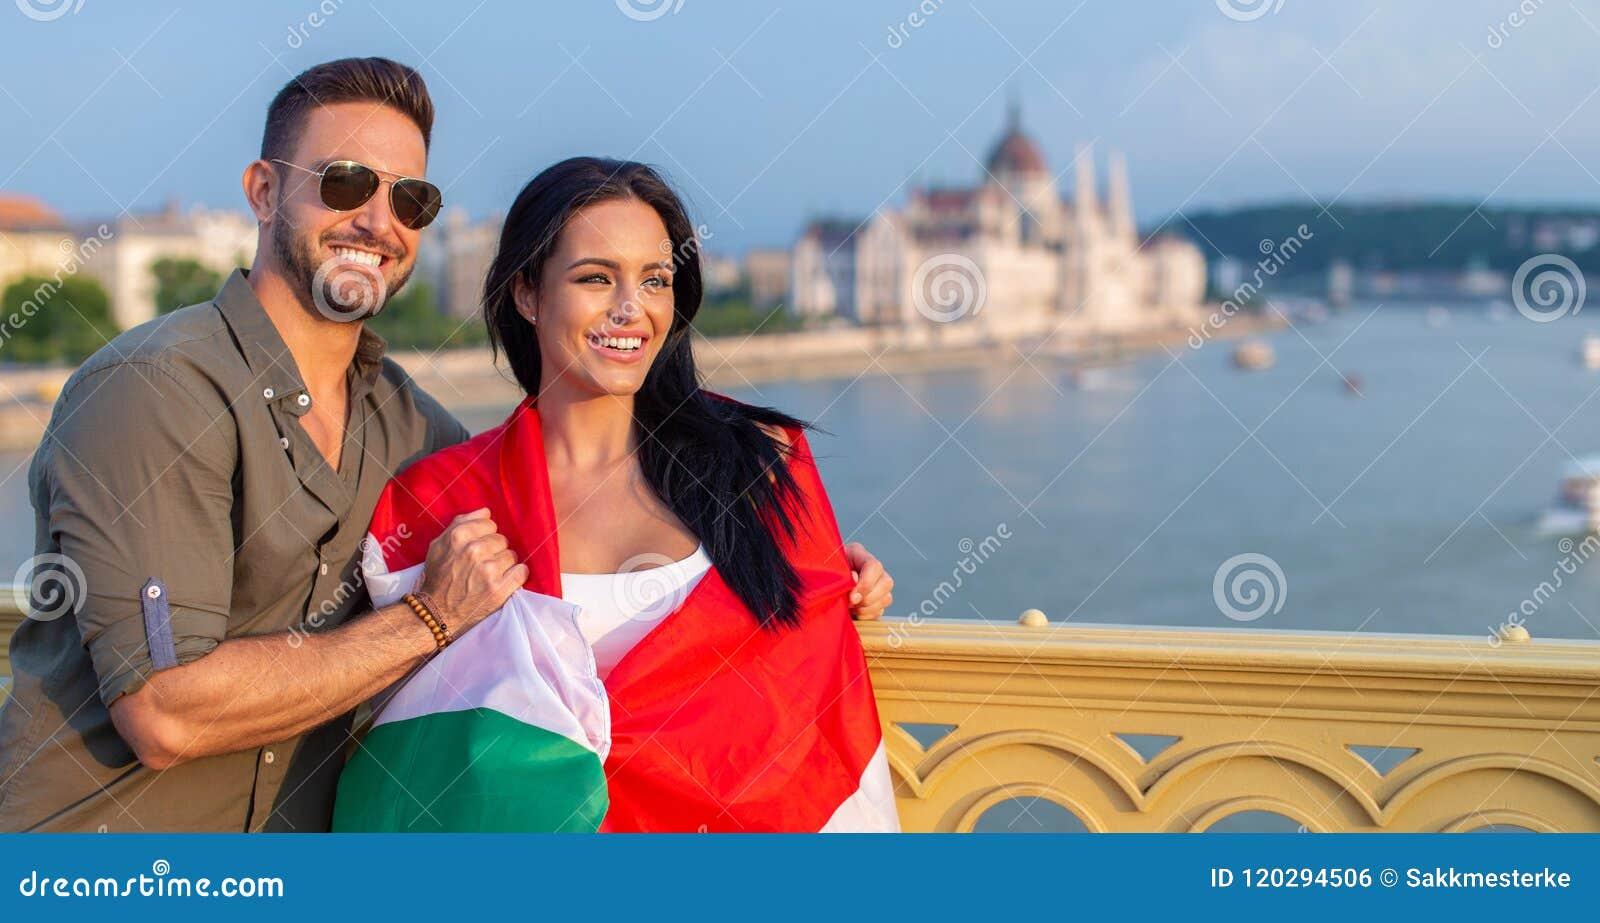 Budapesta Woman Dating